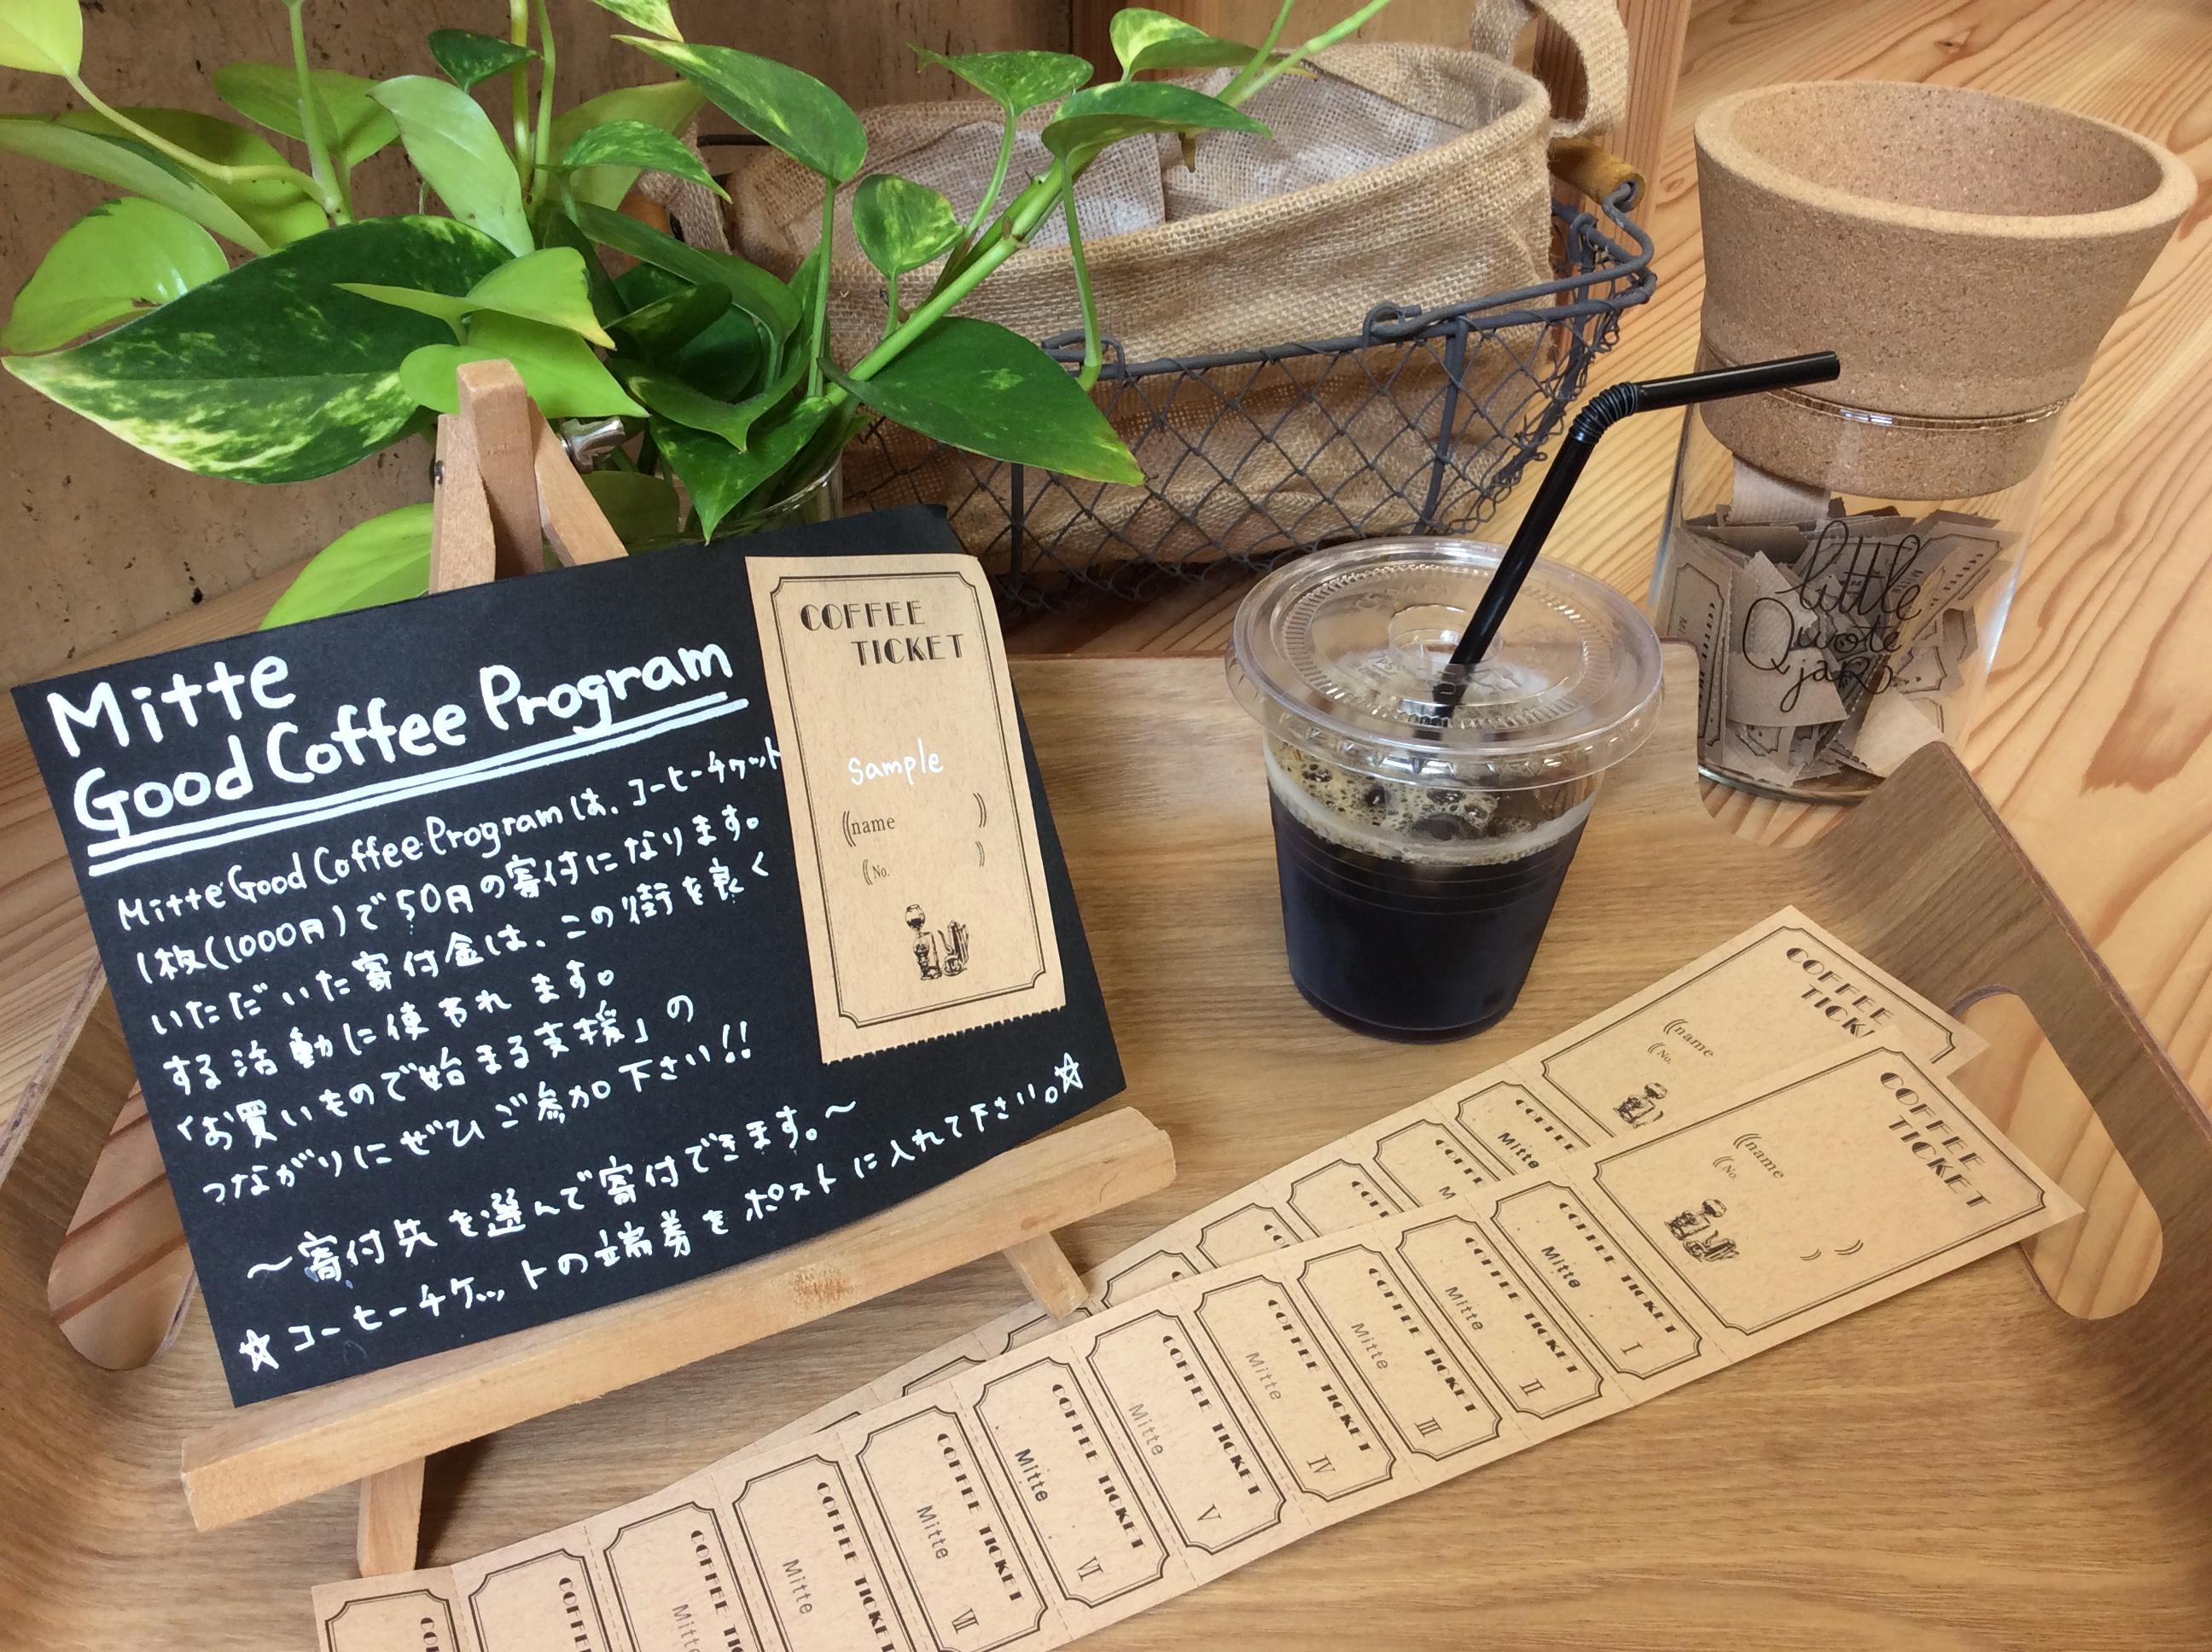 Mitte Good Coffee Program 1月のご報告